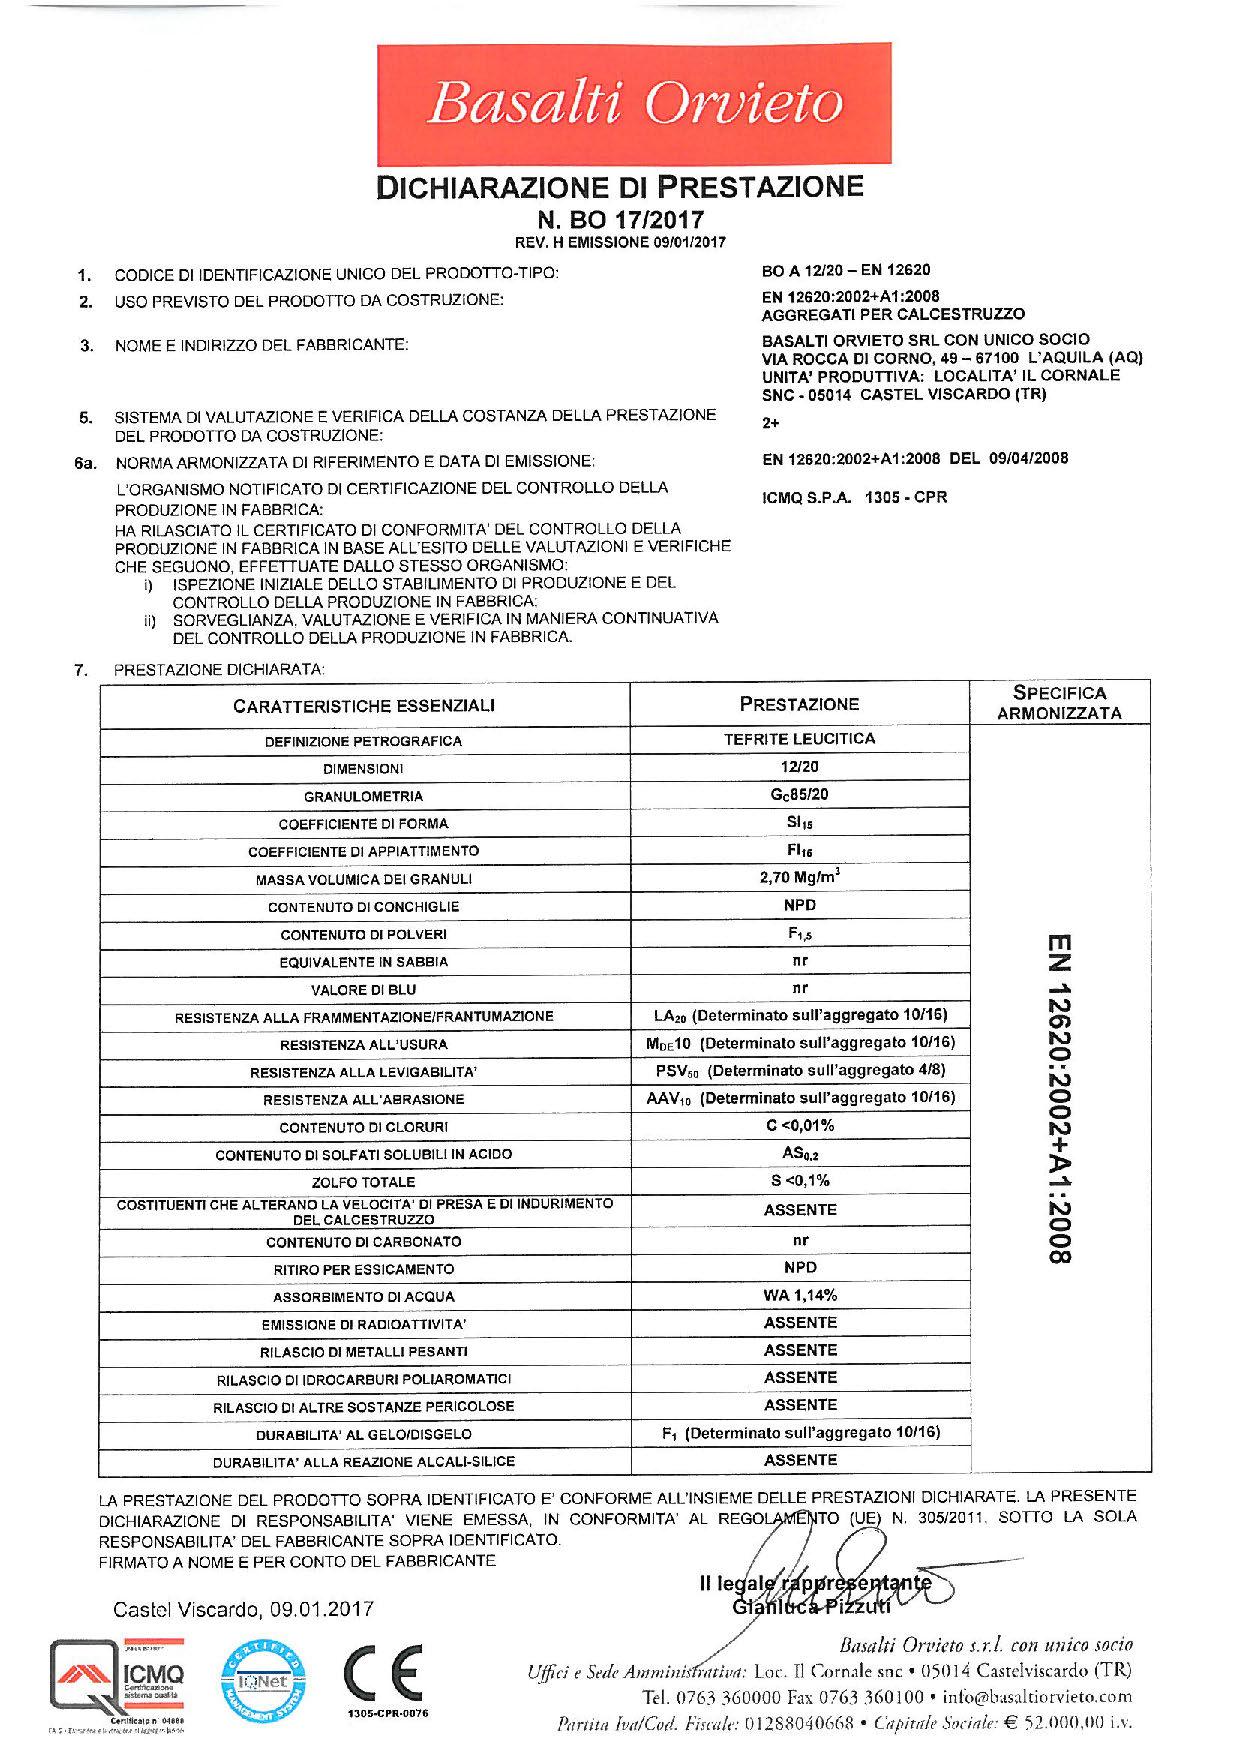 Calcestruzzo_DoP 12-20 - EN 12620